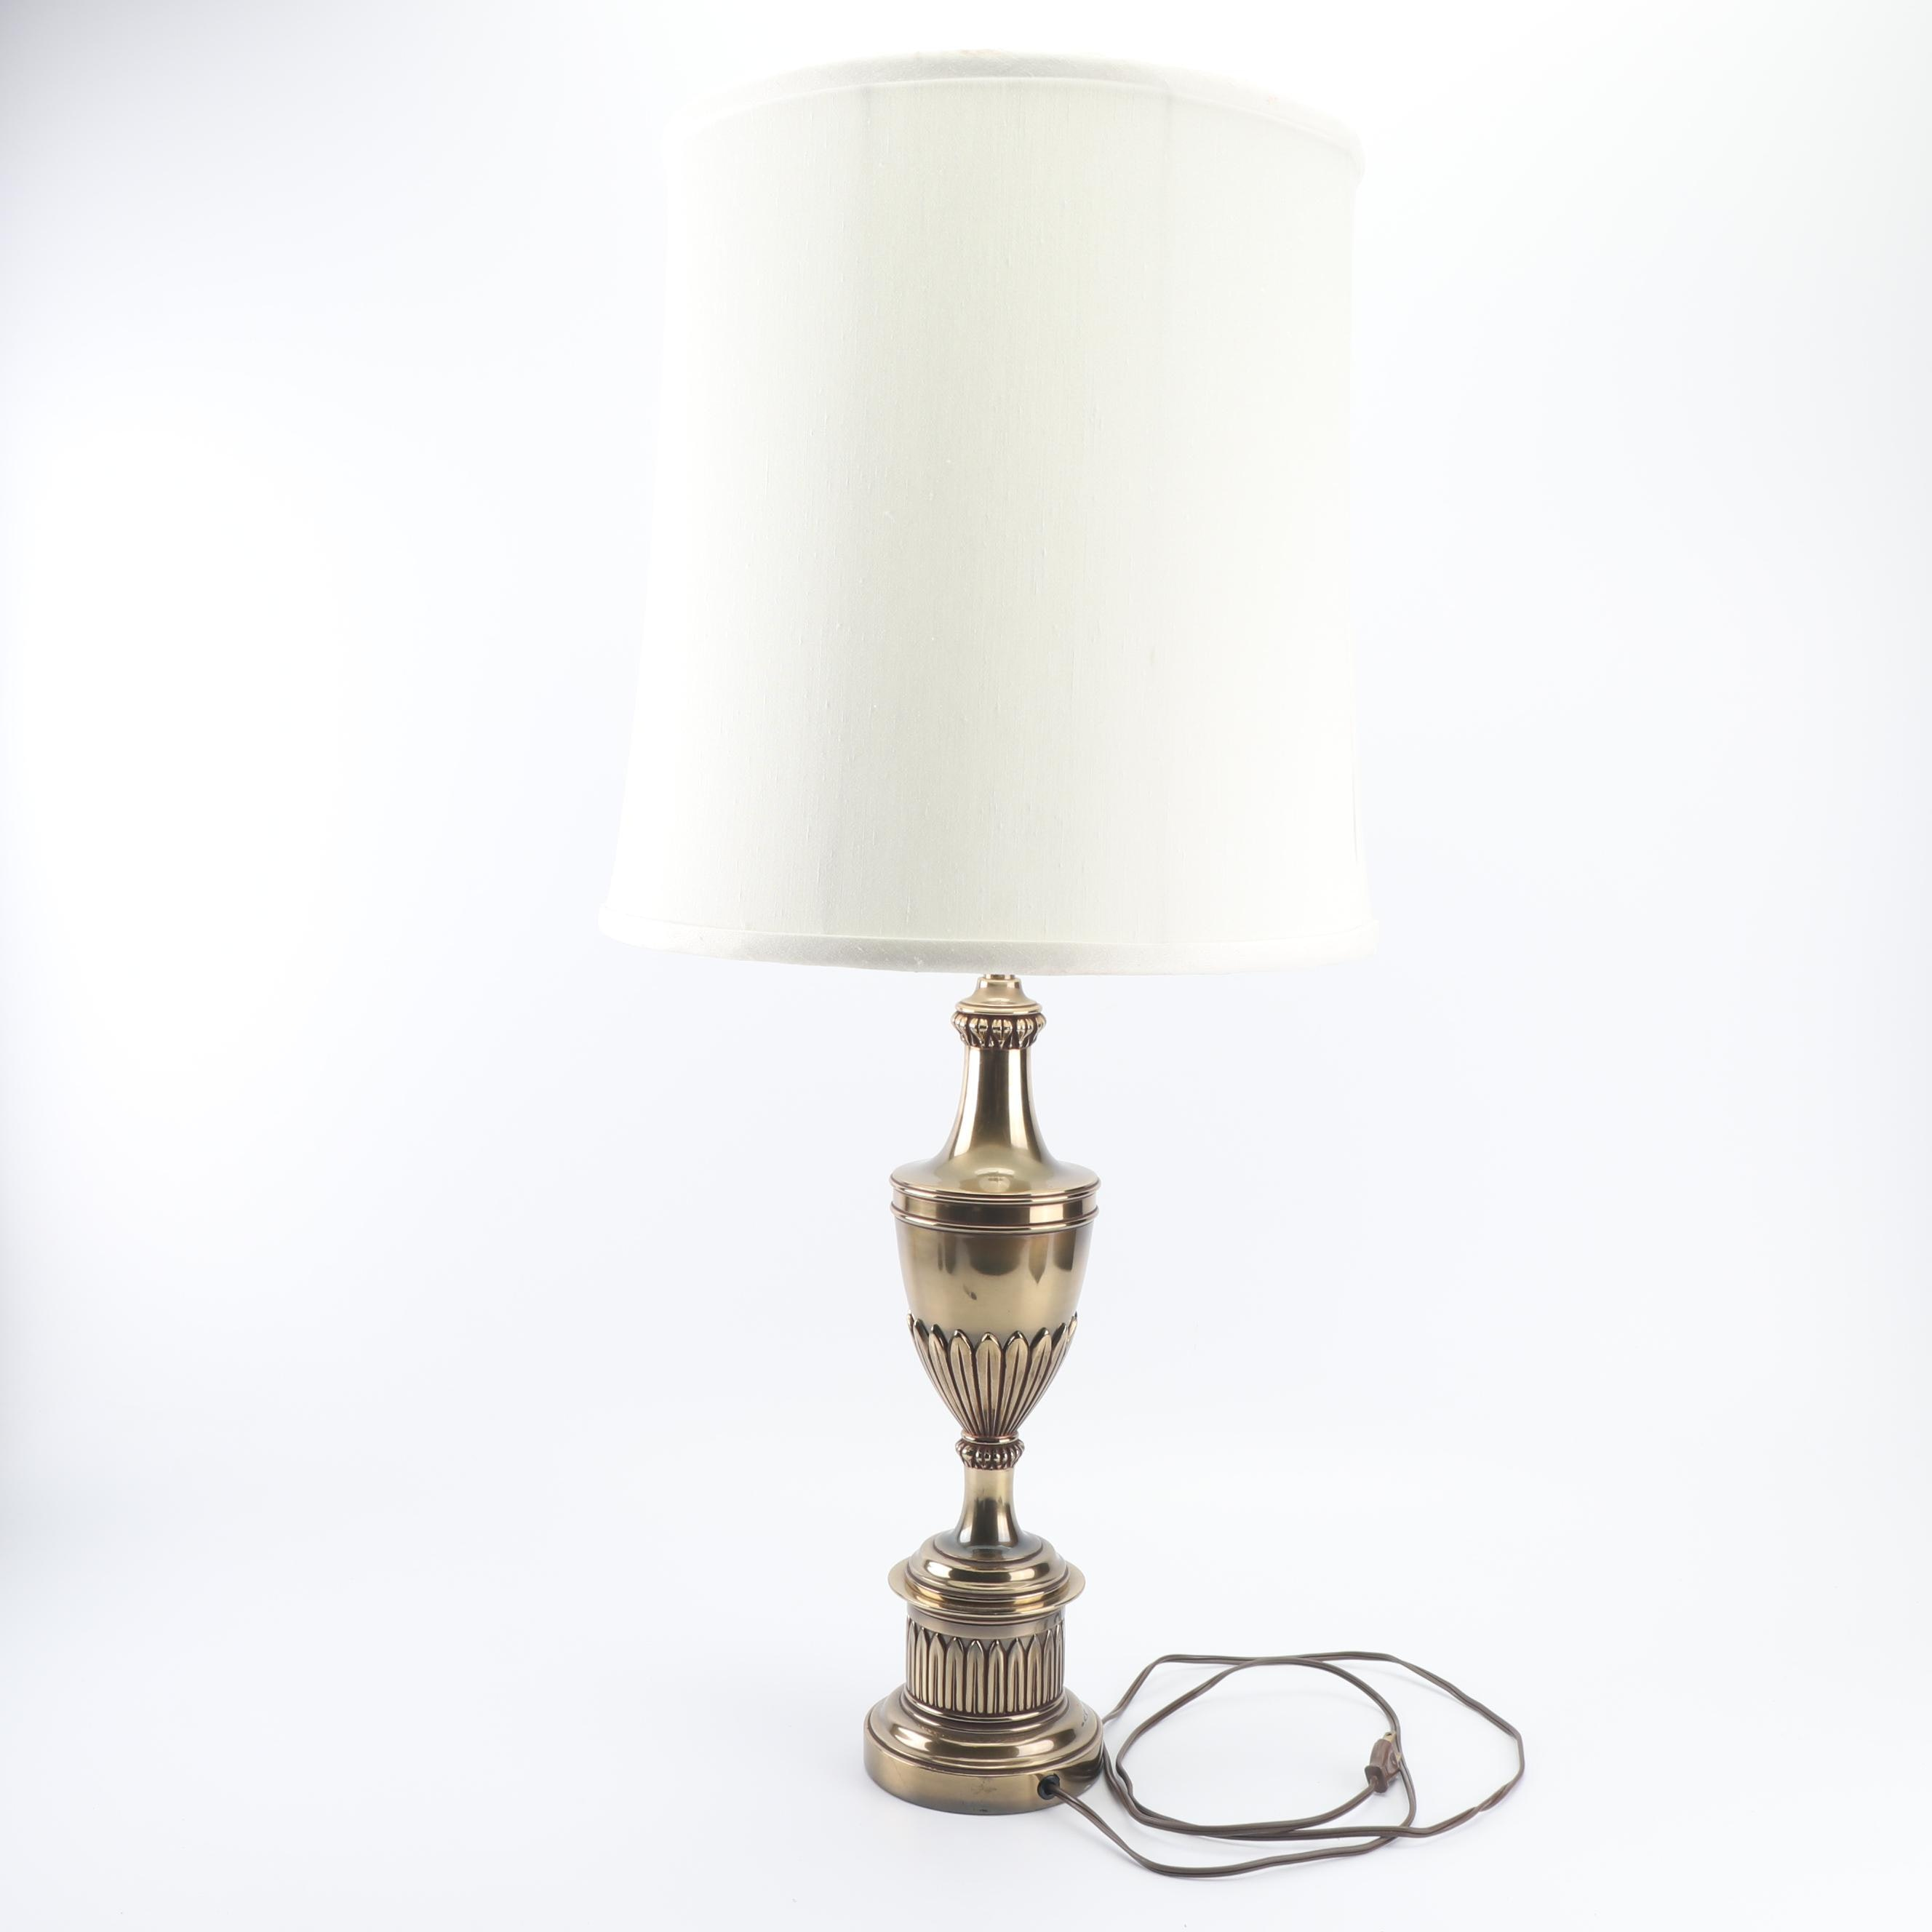 Stiffel Style Brass Lamp and Stiffel Shade